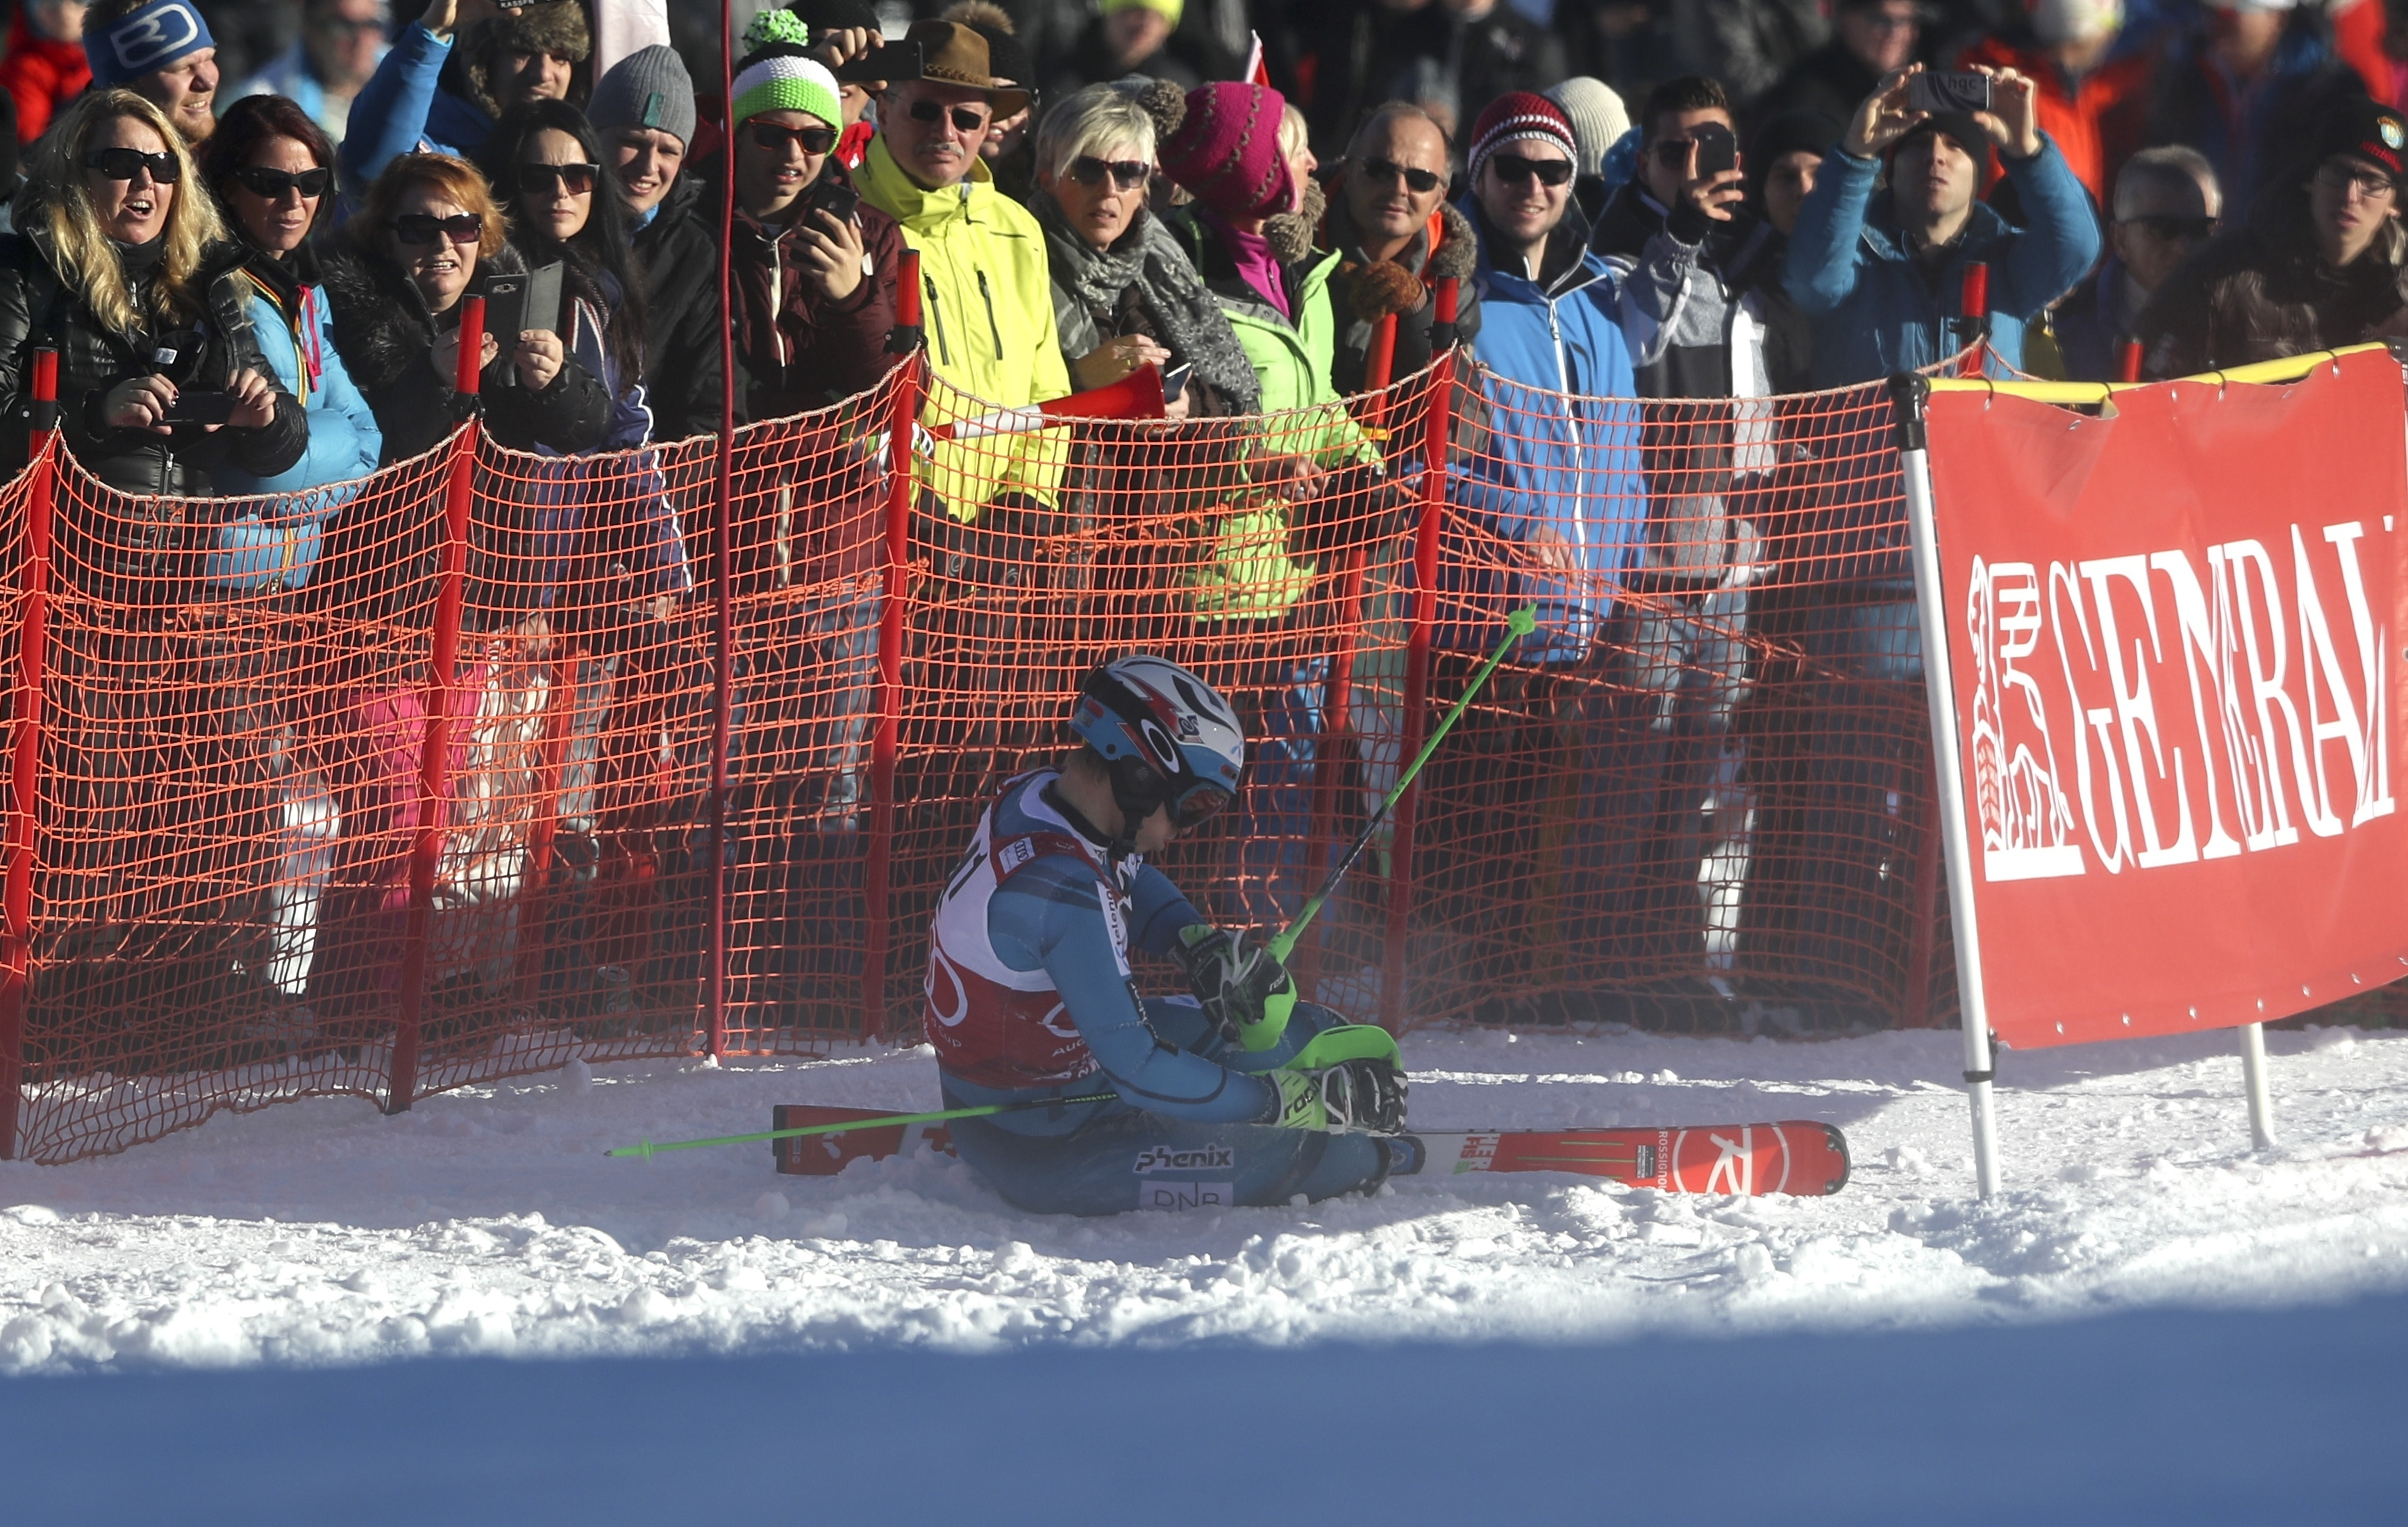 Norway's Henrik Kristoffersen lies in the snow after skiing off course during an alpine ski, men's World Cup slalom, in Kitzbuehel, Austria, Sunday, Jan. 22, 2017. (AP Photo/Shinichiro Tanaka)